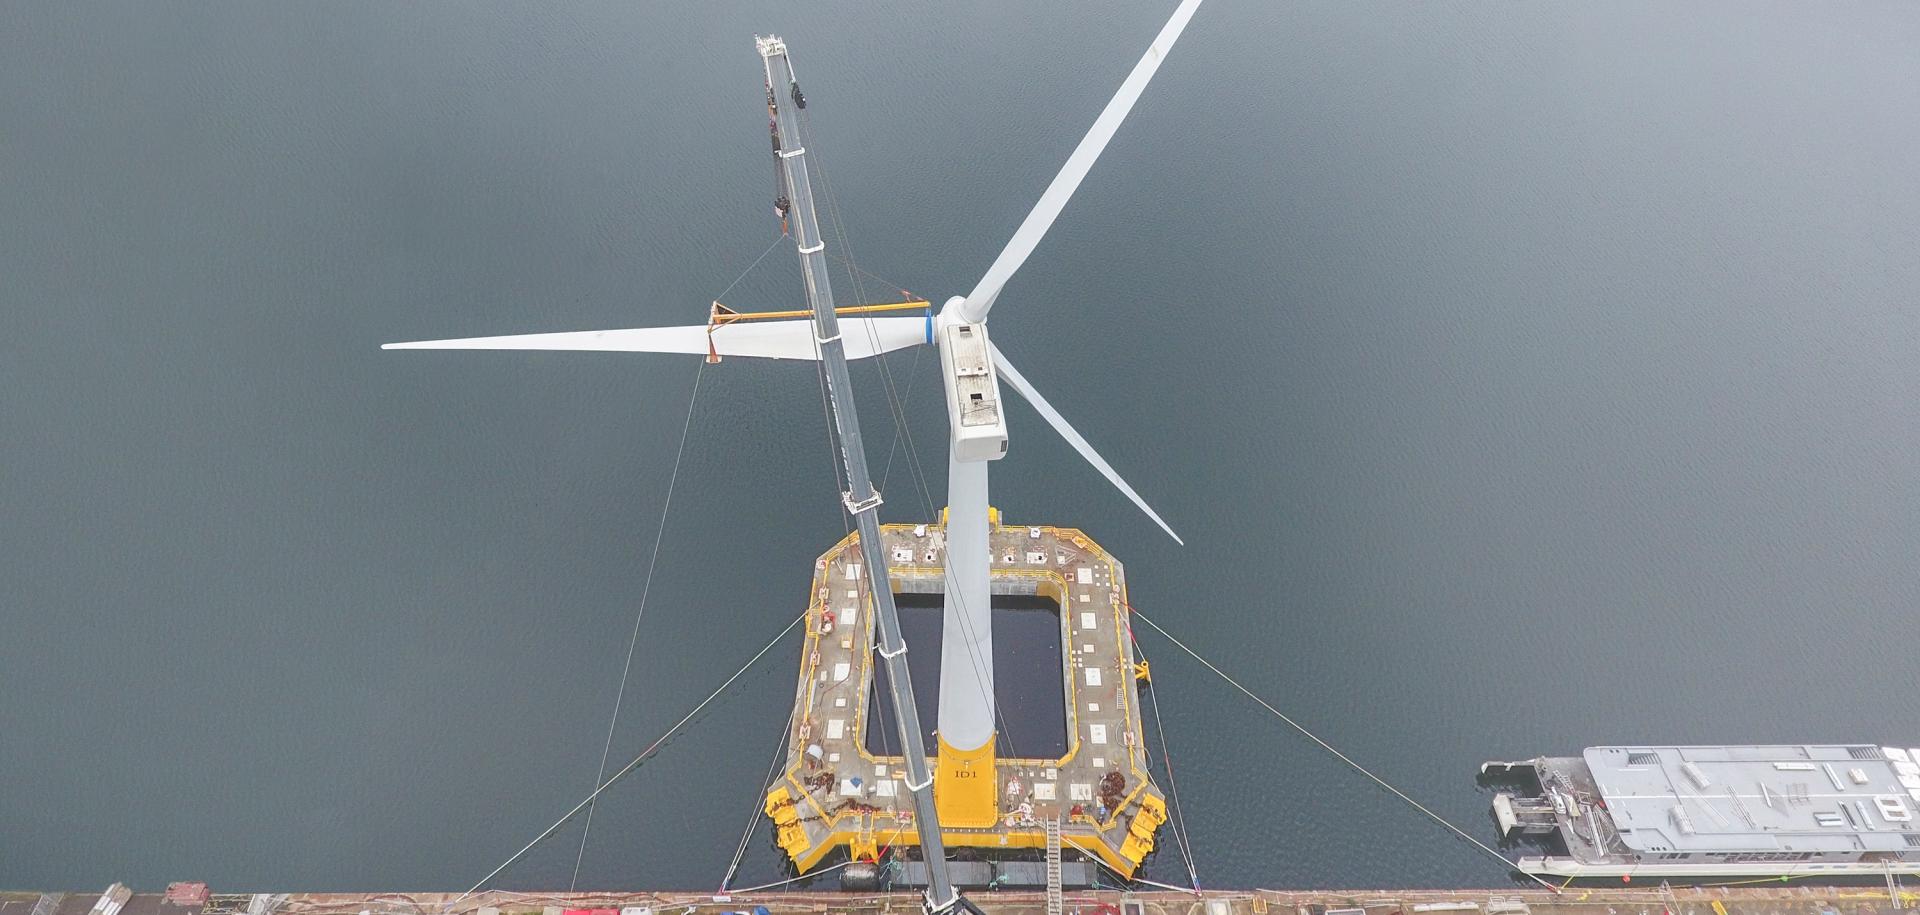 The Floatgen wind turbine